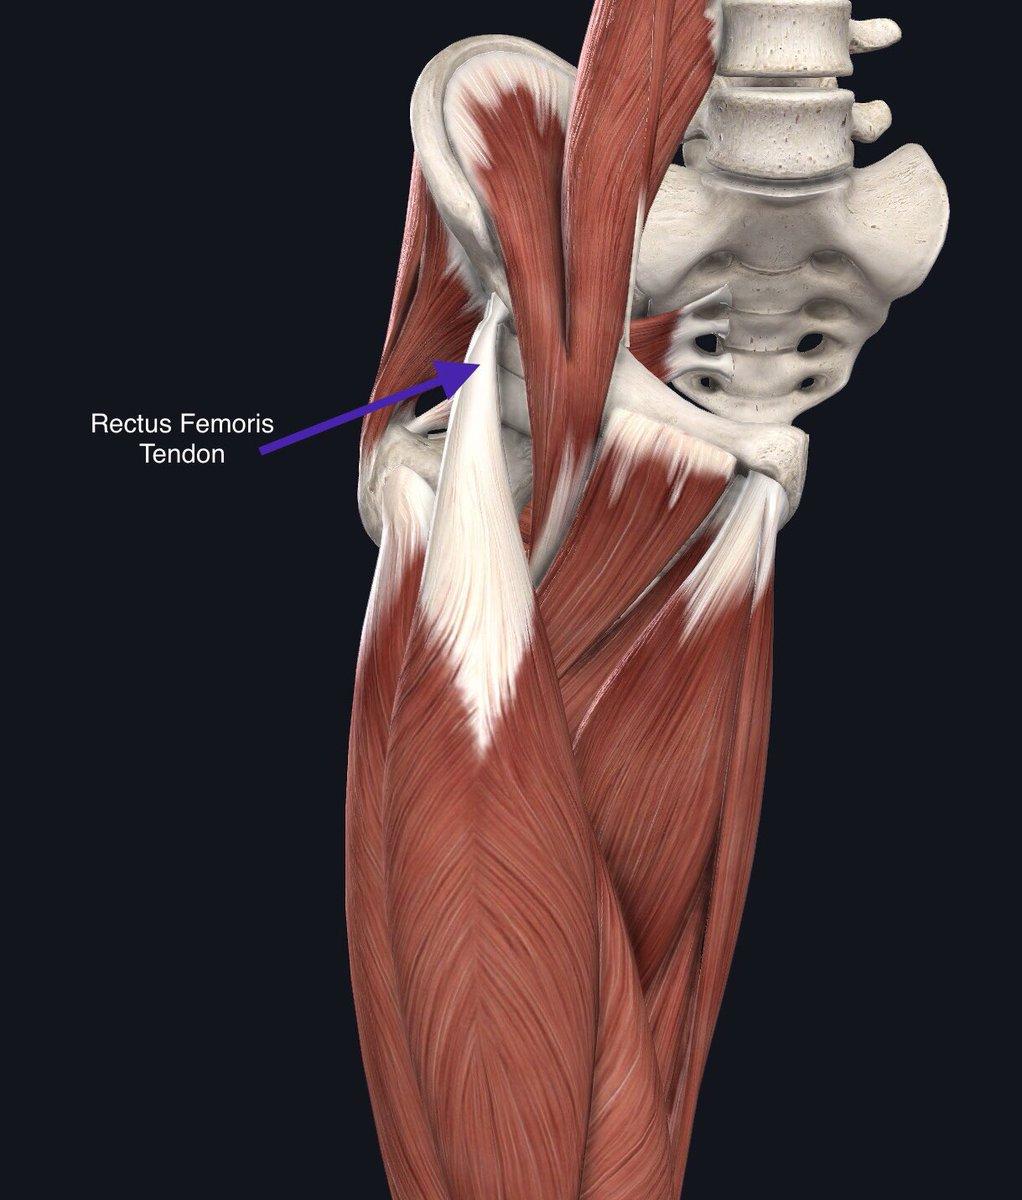 Closer look at Ramiro Funes Mori's injury. Will be surgically repaired. #LaLiga #VillarrealCFpic.twitter.com/F5WVcTdGNW